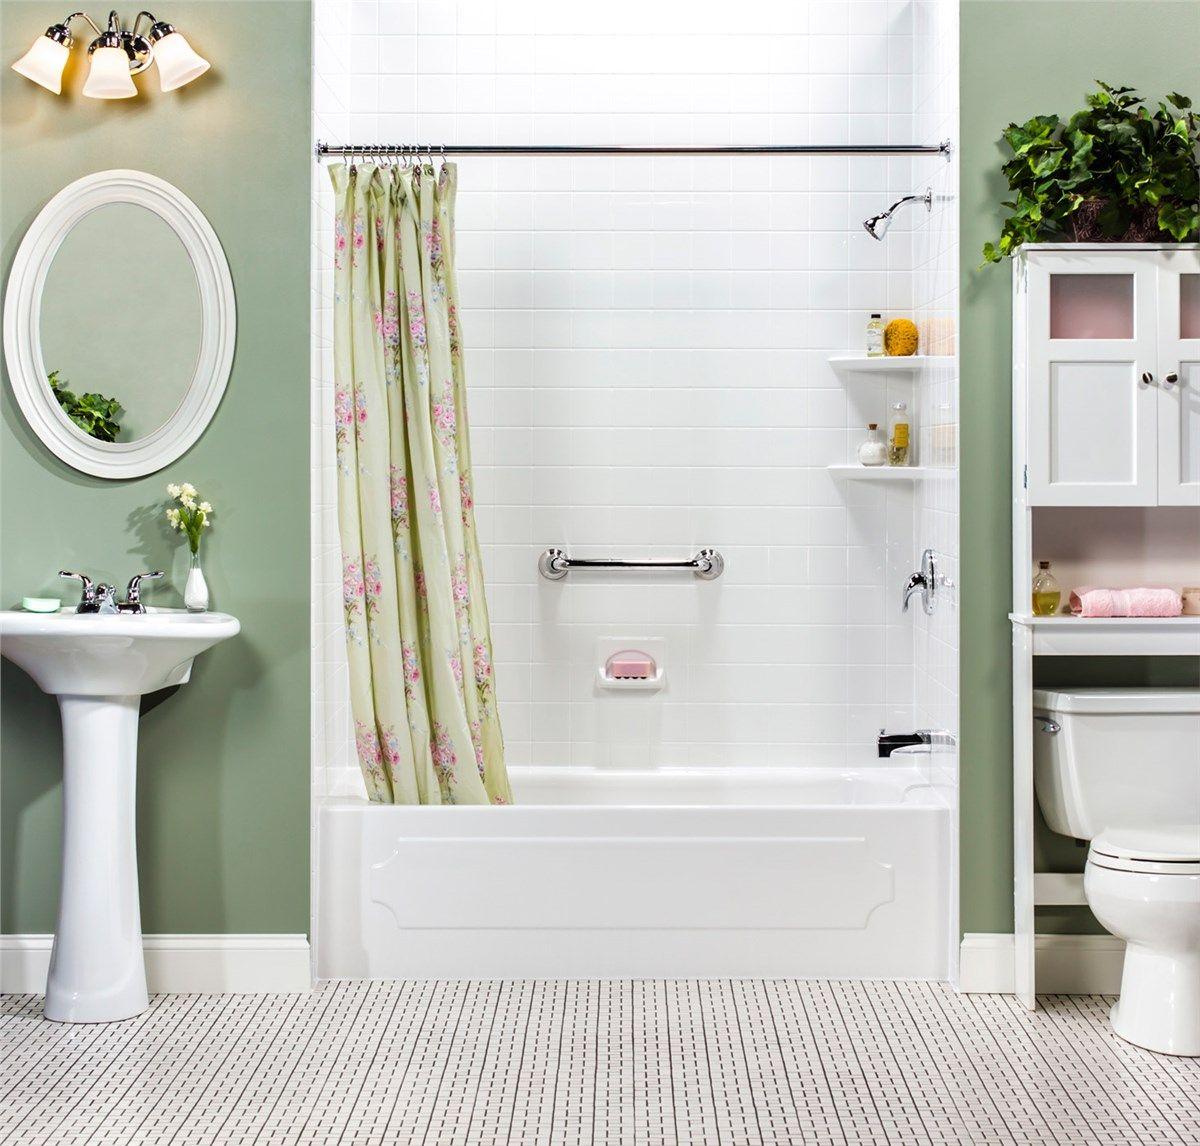 Bathroom Remodeling Green Bay Wi Best Paint For Interior Walls - Bathroom remodel la crosse wi